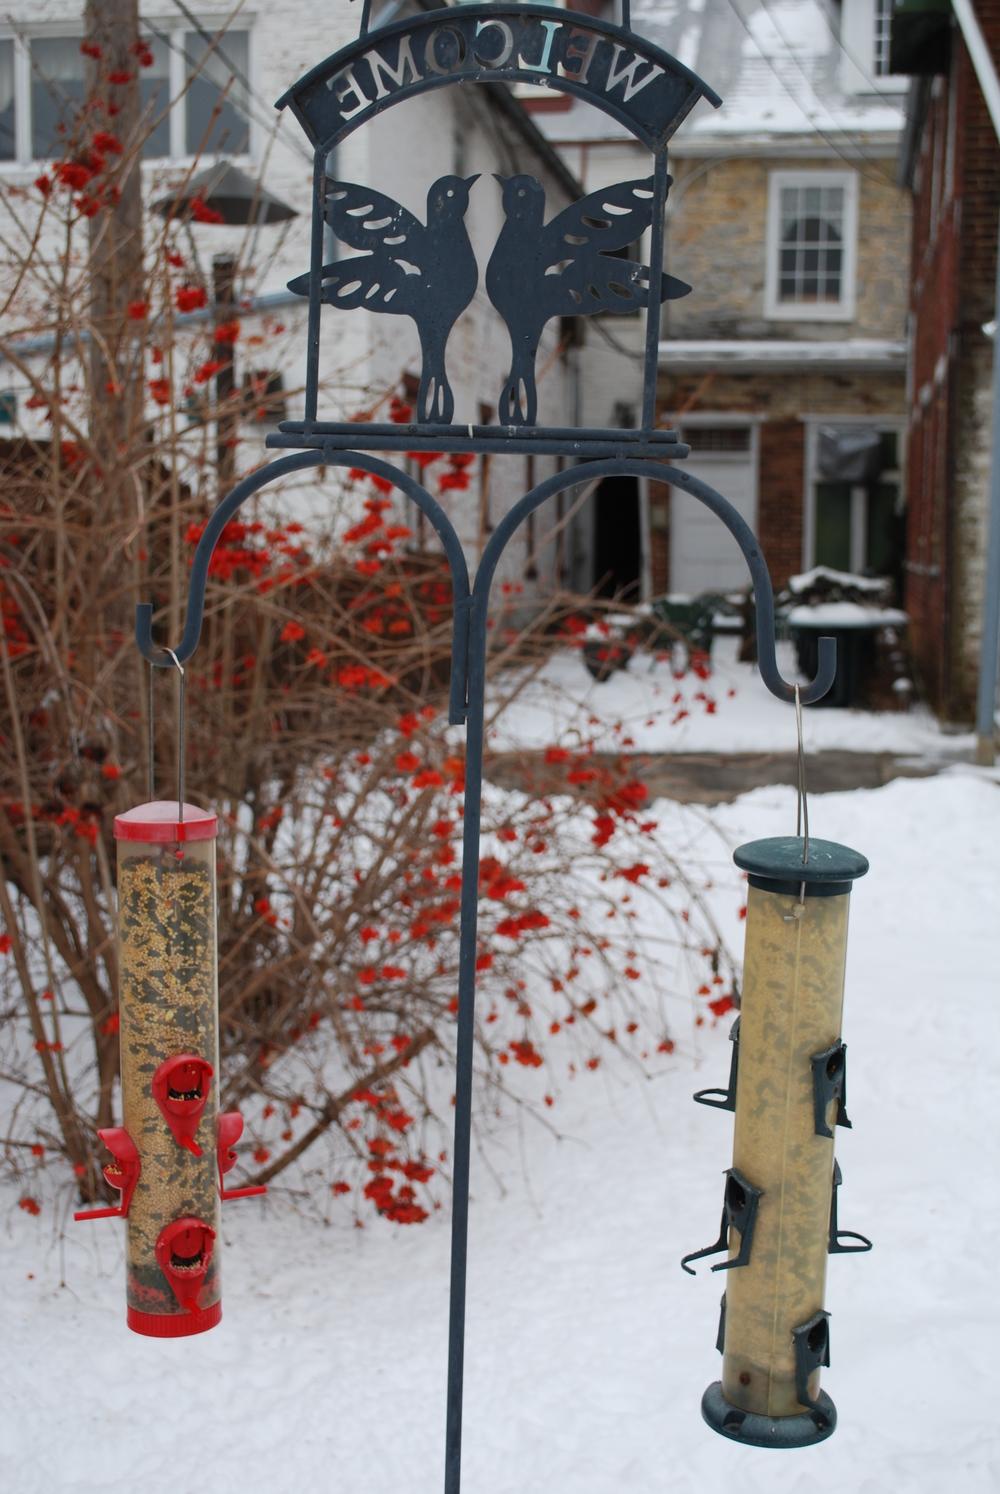 backyard birdfeeders and cranberry bush